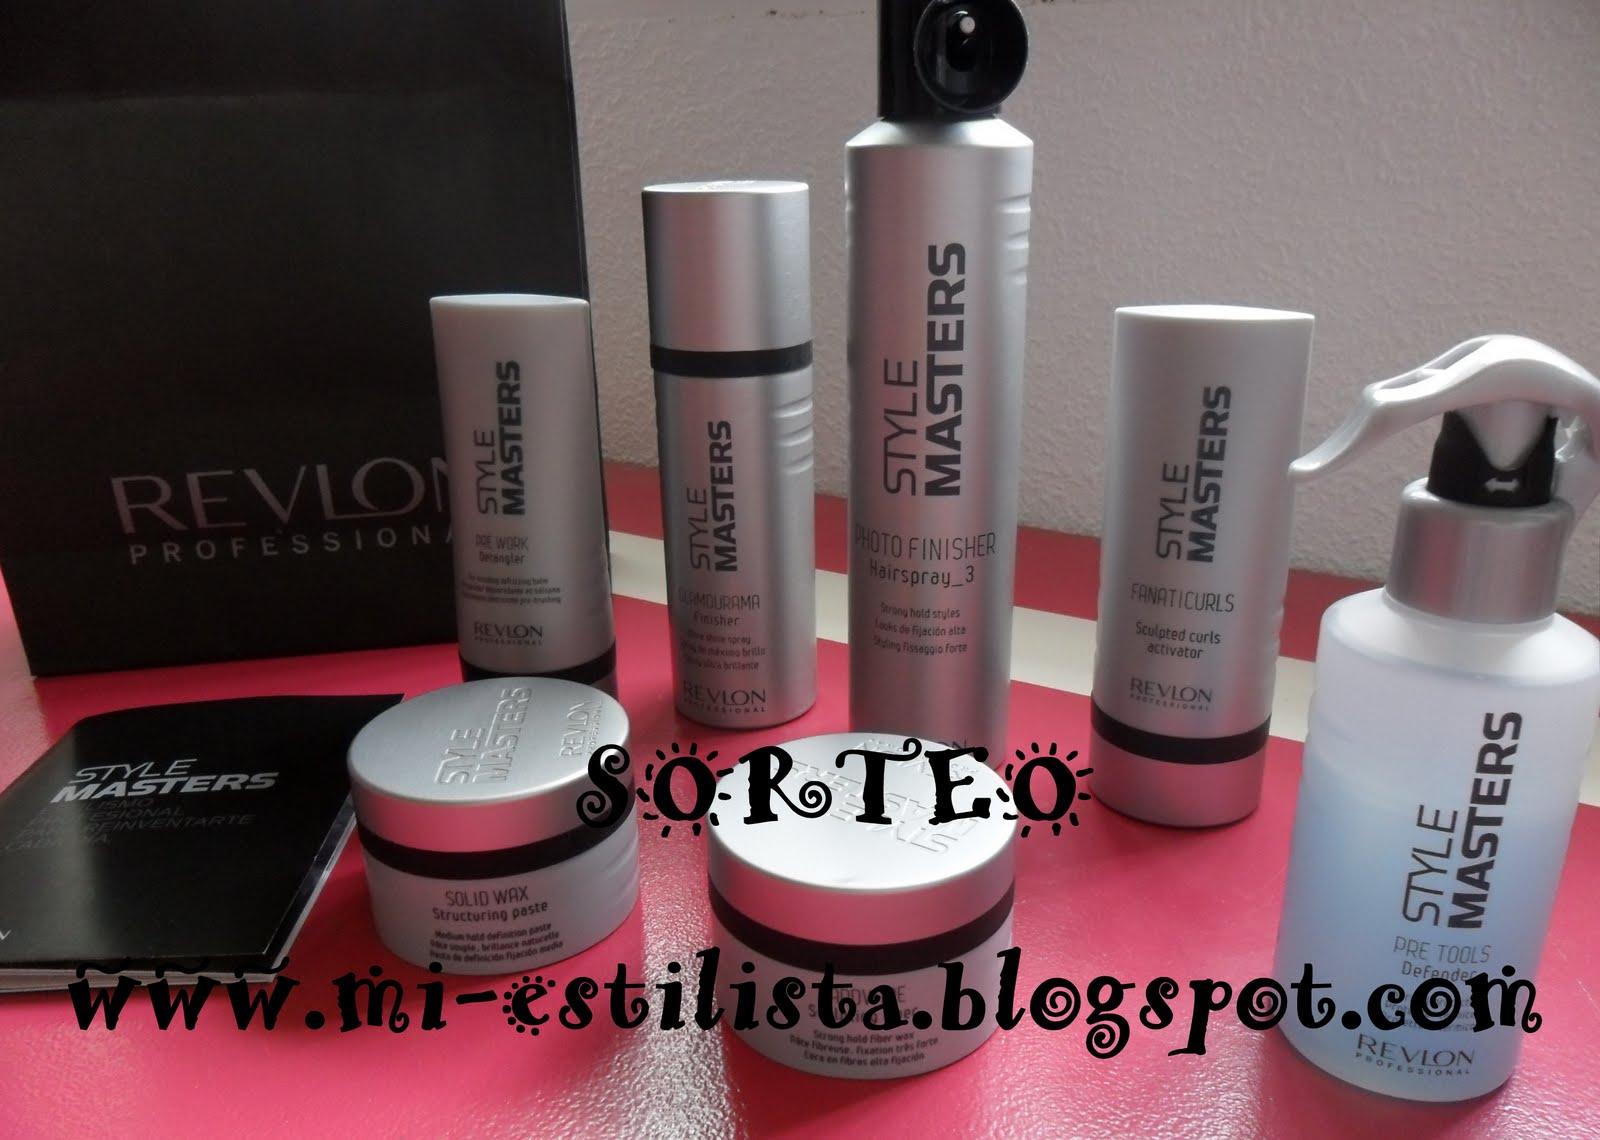 Sorteo lote de productos REVLON PROFESSIONAL!!;